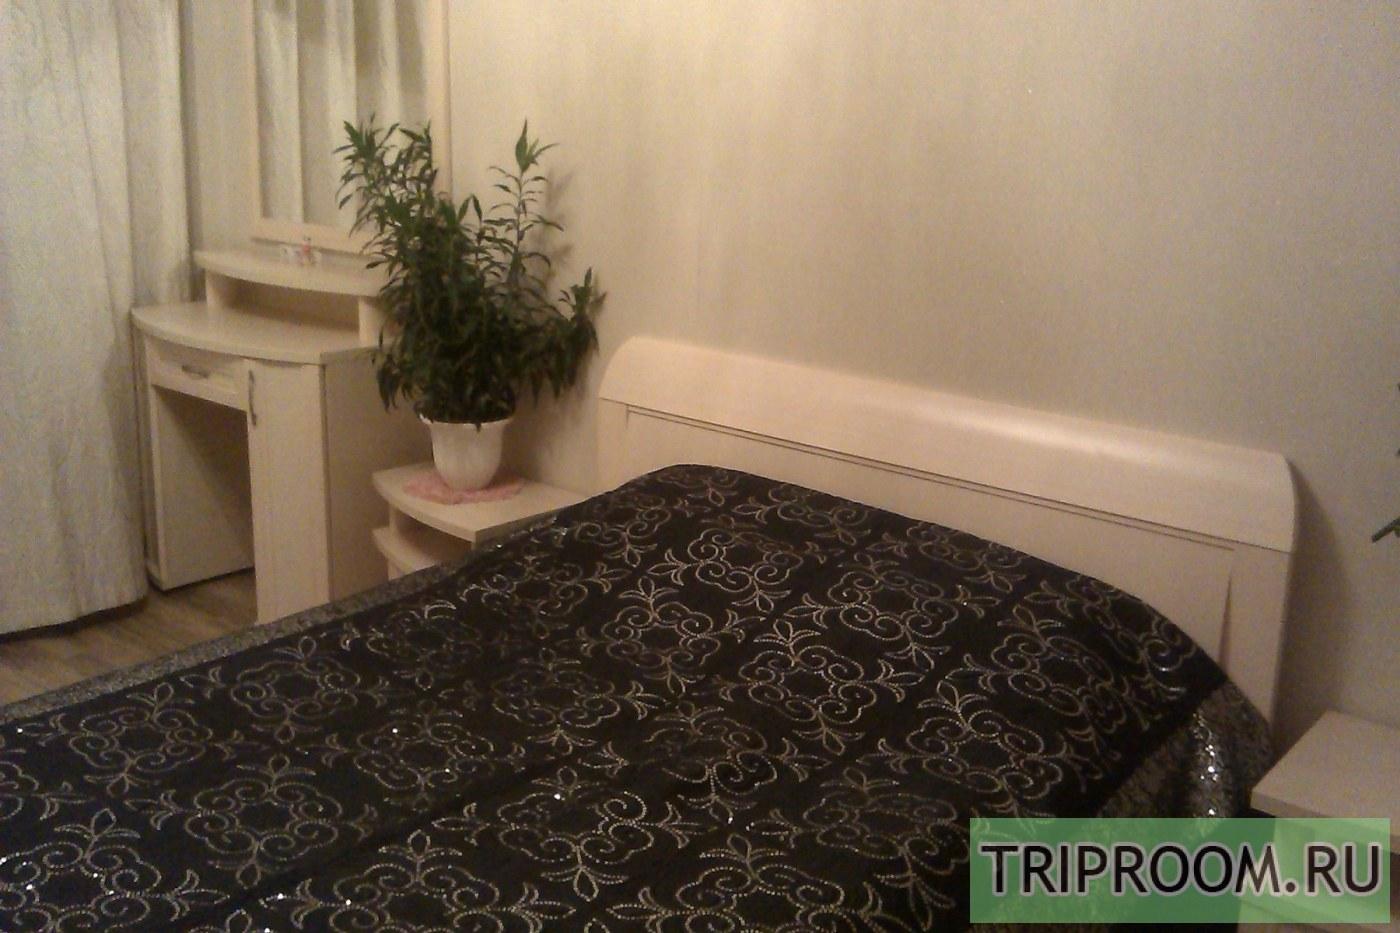 3-комнатная квартира посуточно (вариант № 39631), ул. Кирова улица, фото № 1